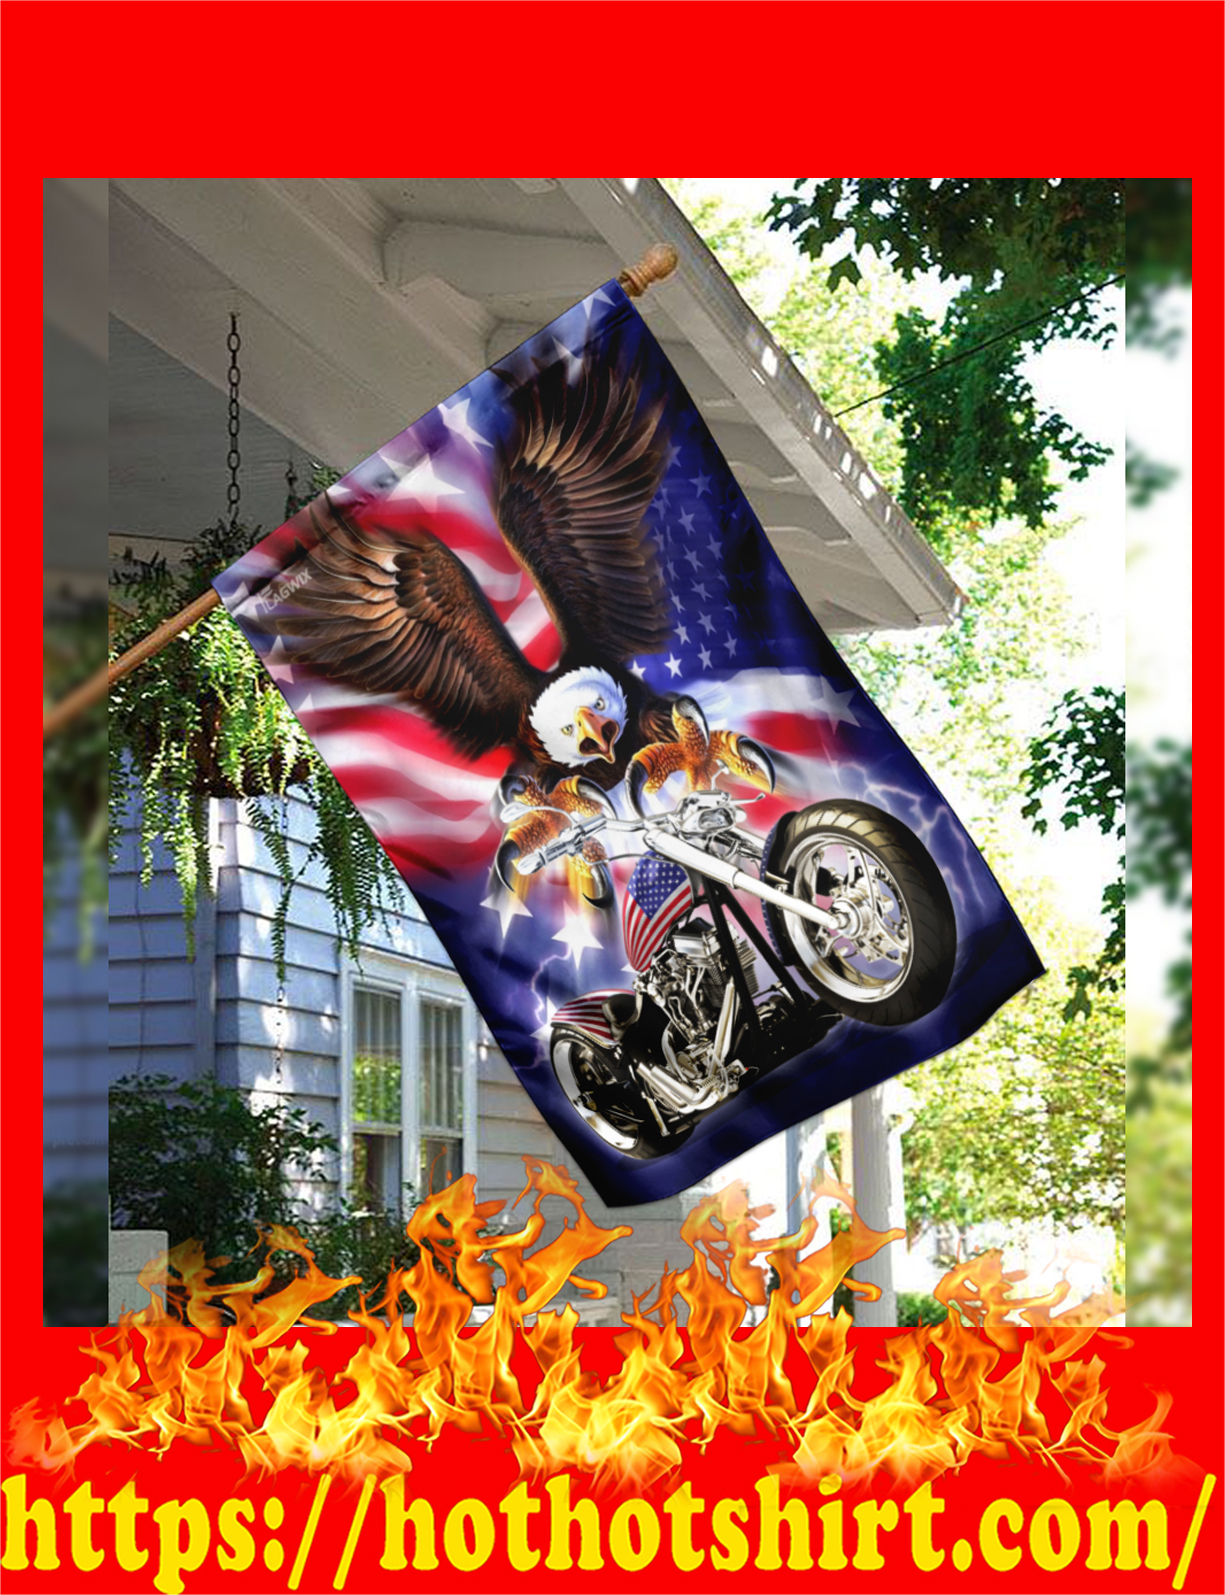 Motorcyle biker american eagle flag - pic 1